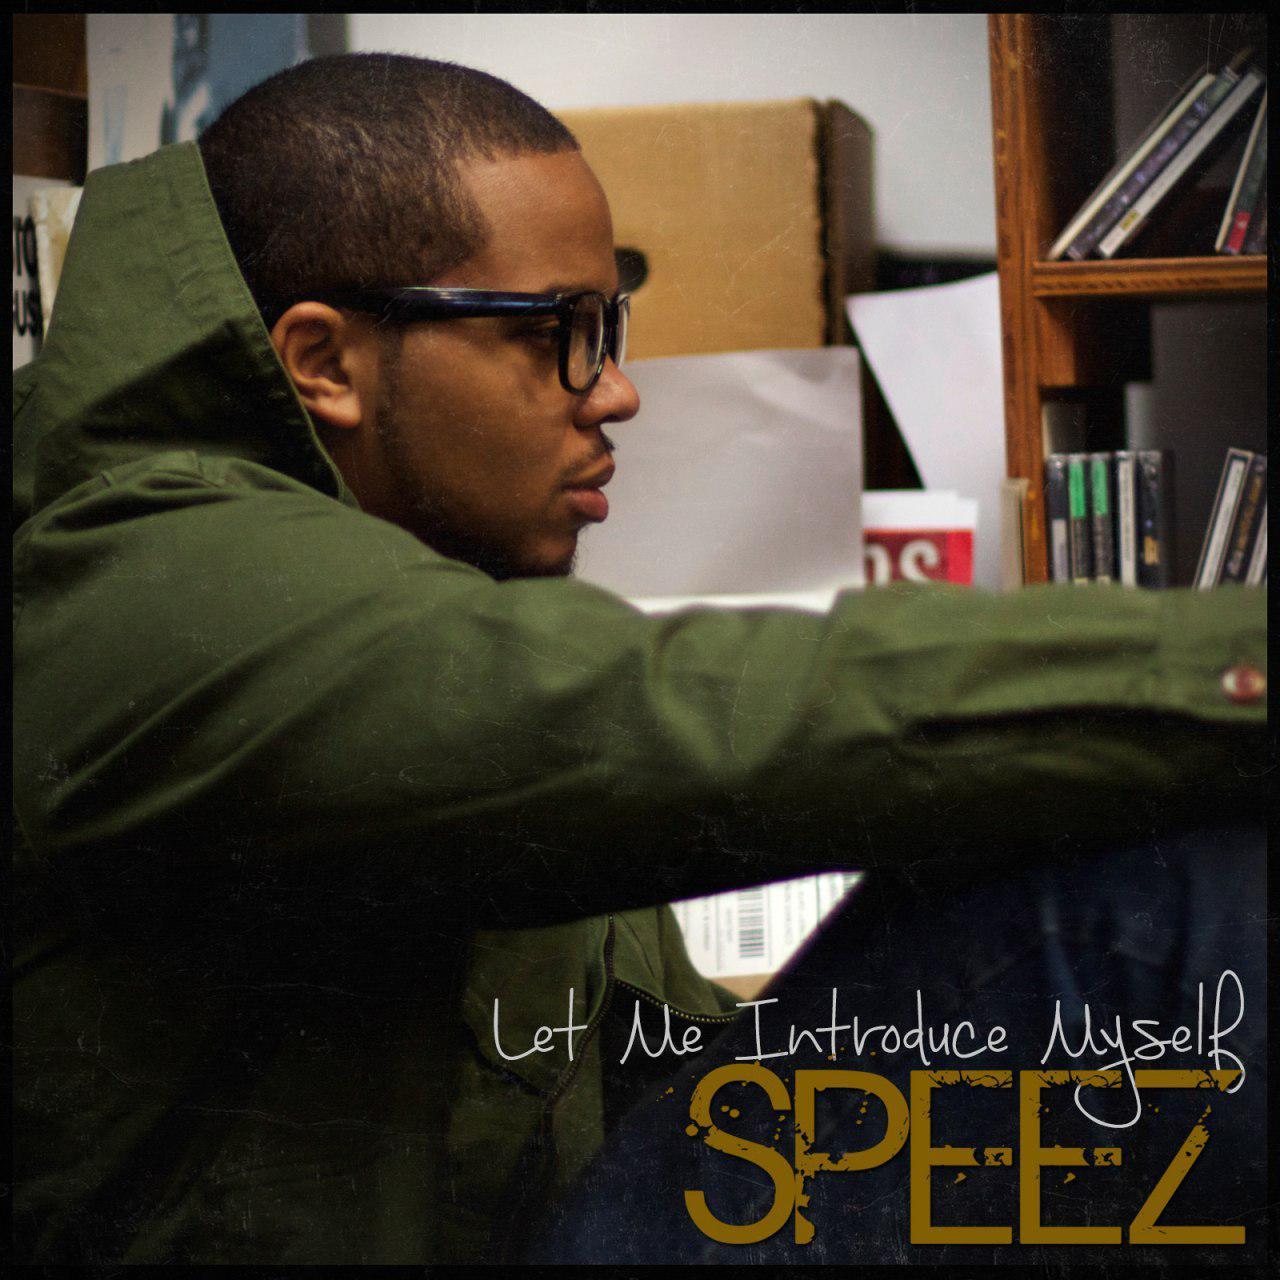 Speez - Let Me Introduce Myself